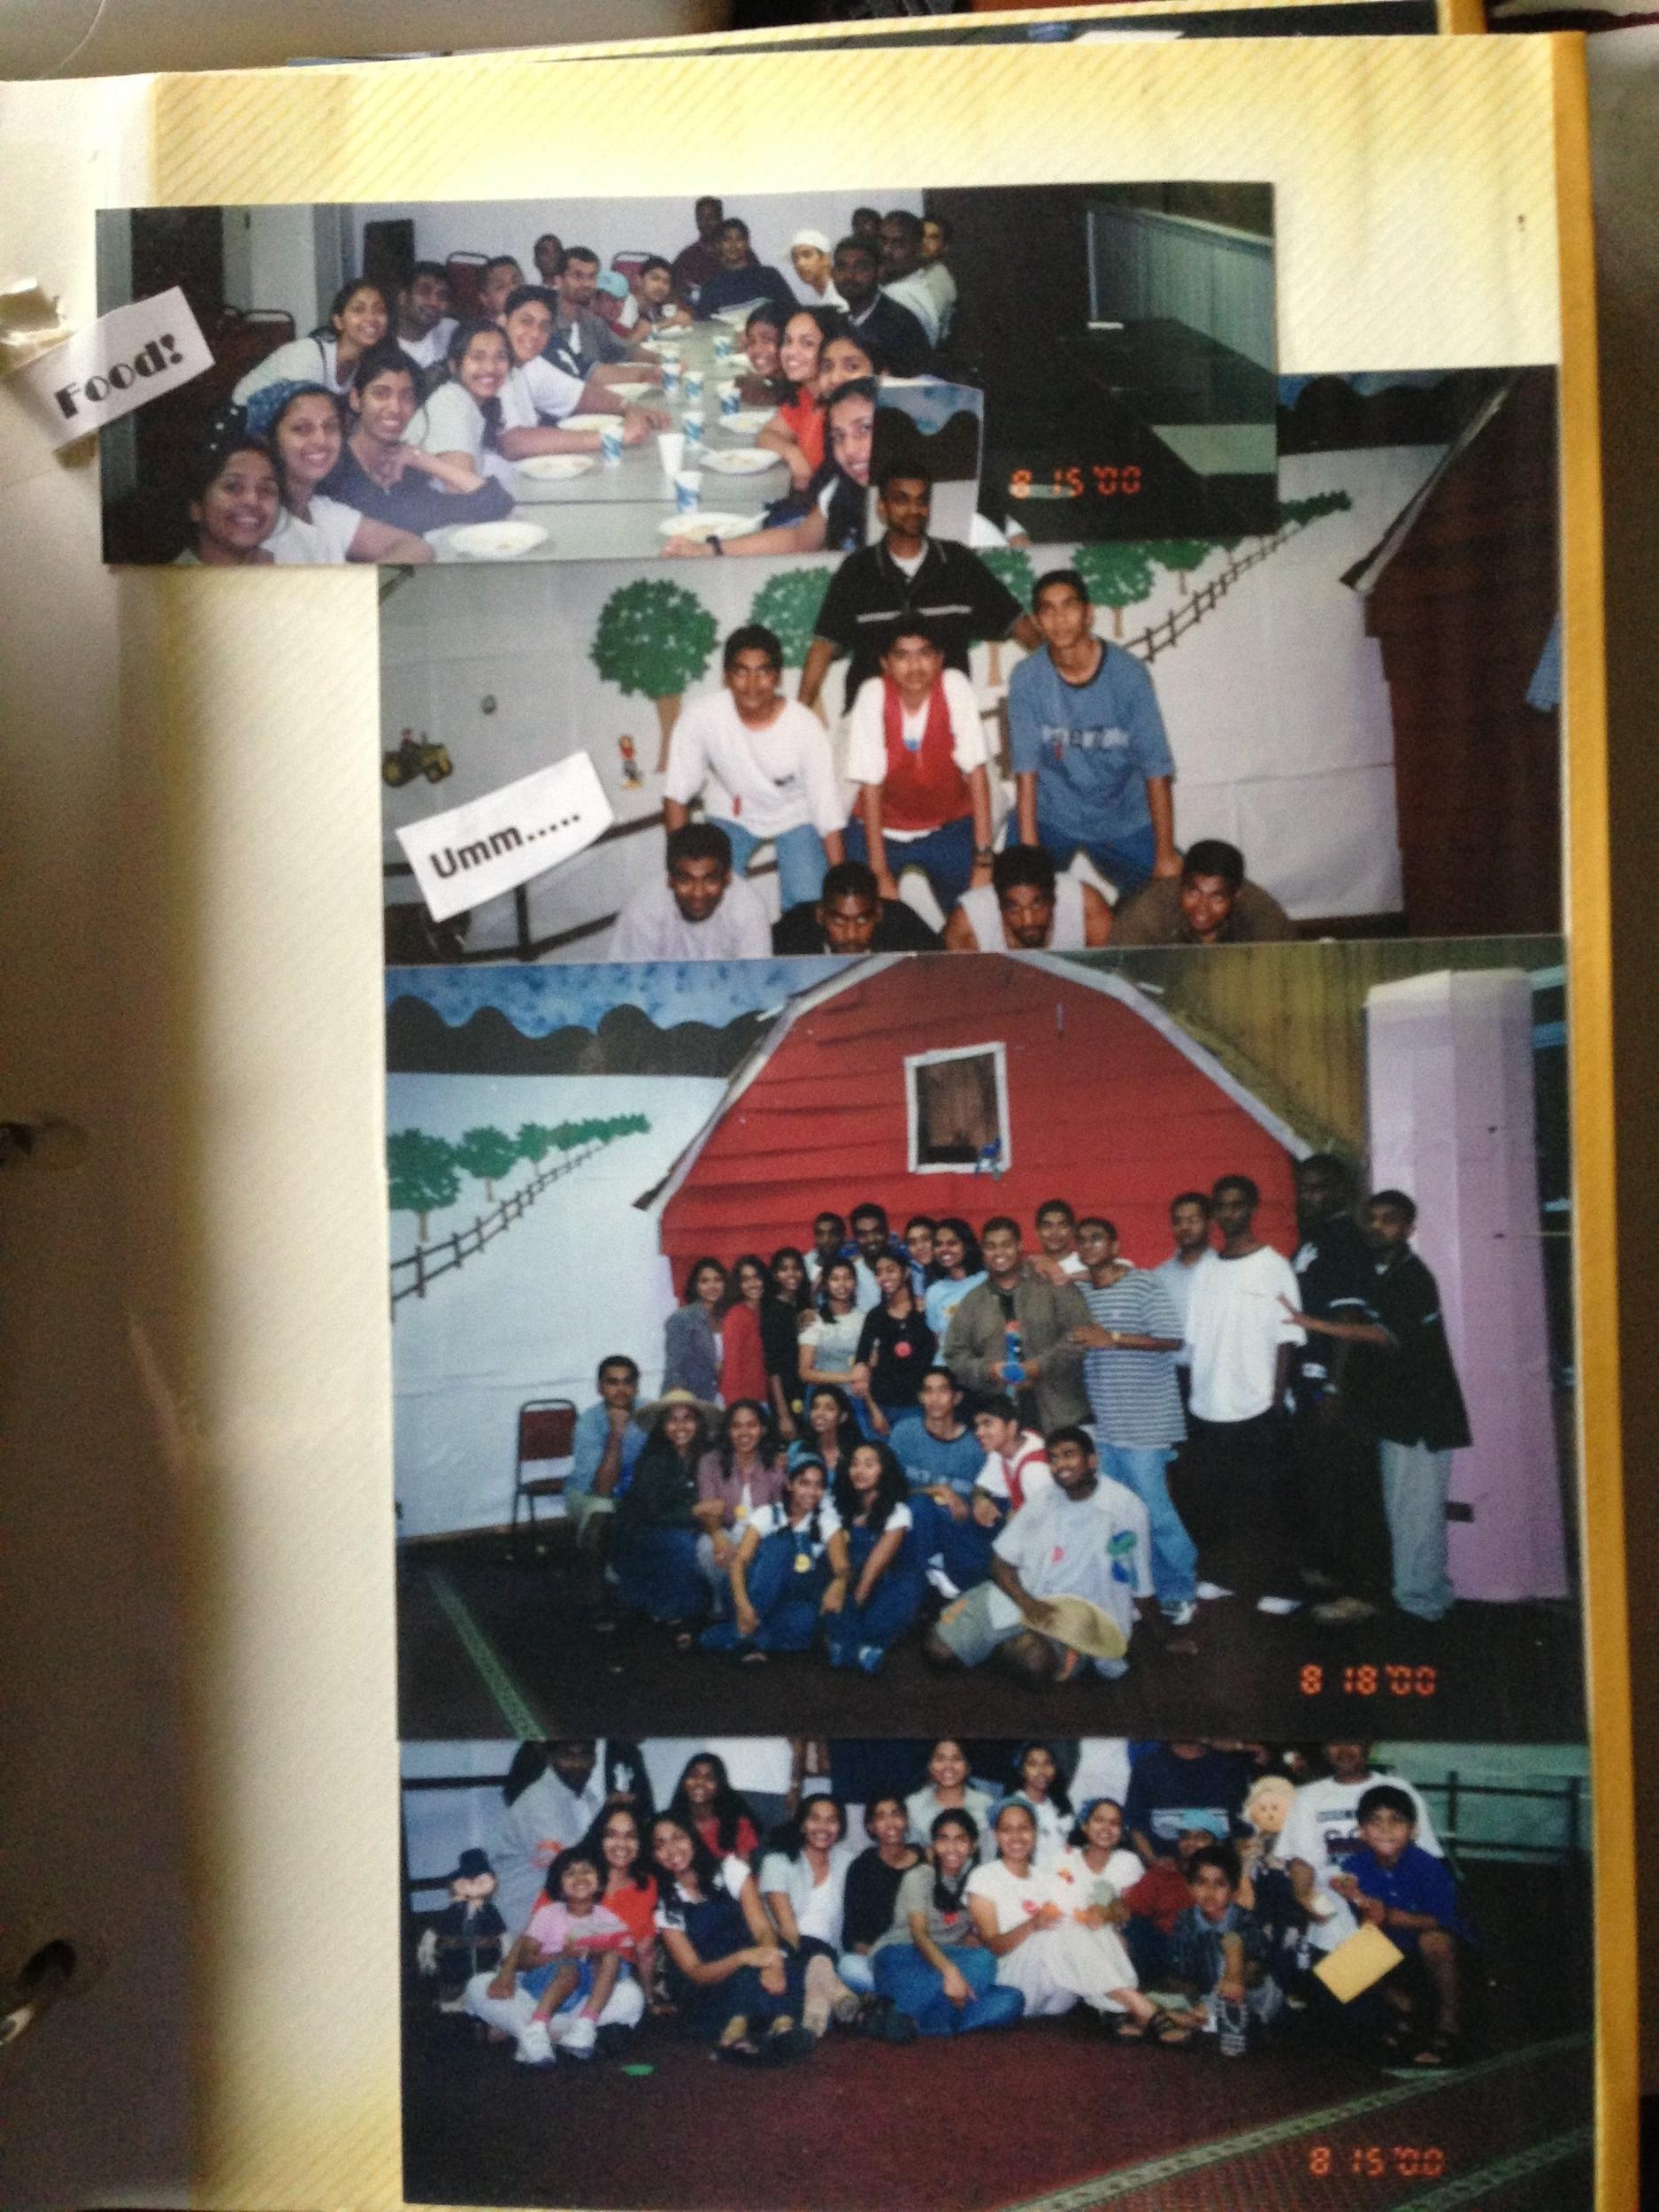 Photo Aug 18, 4 27 04 PM.jpg